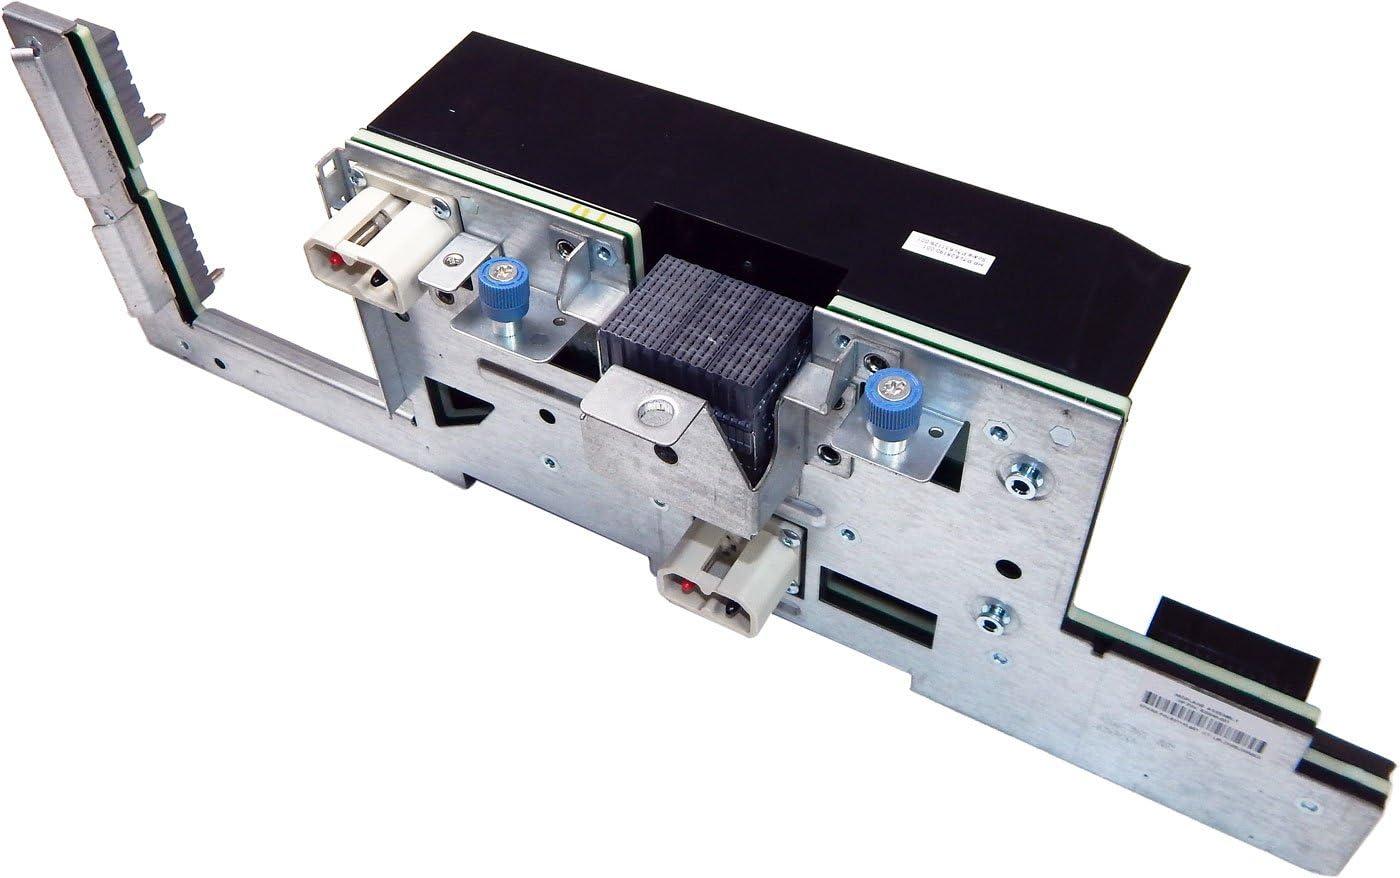 HP E5700 X5520 CSP Midplane Module 631115-001 620048-001 595278-001